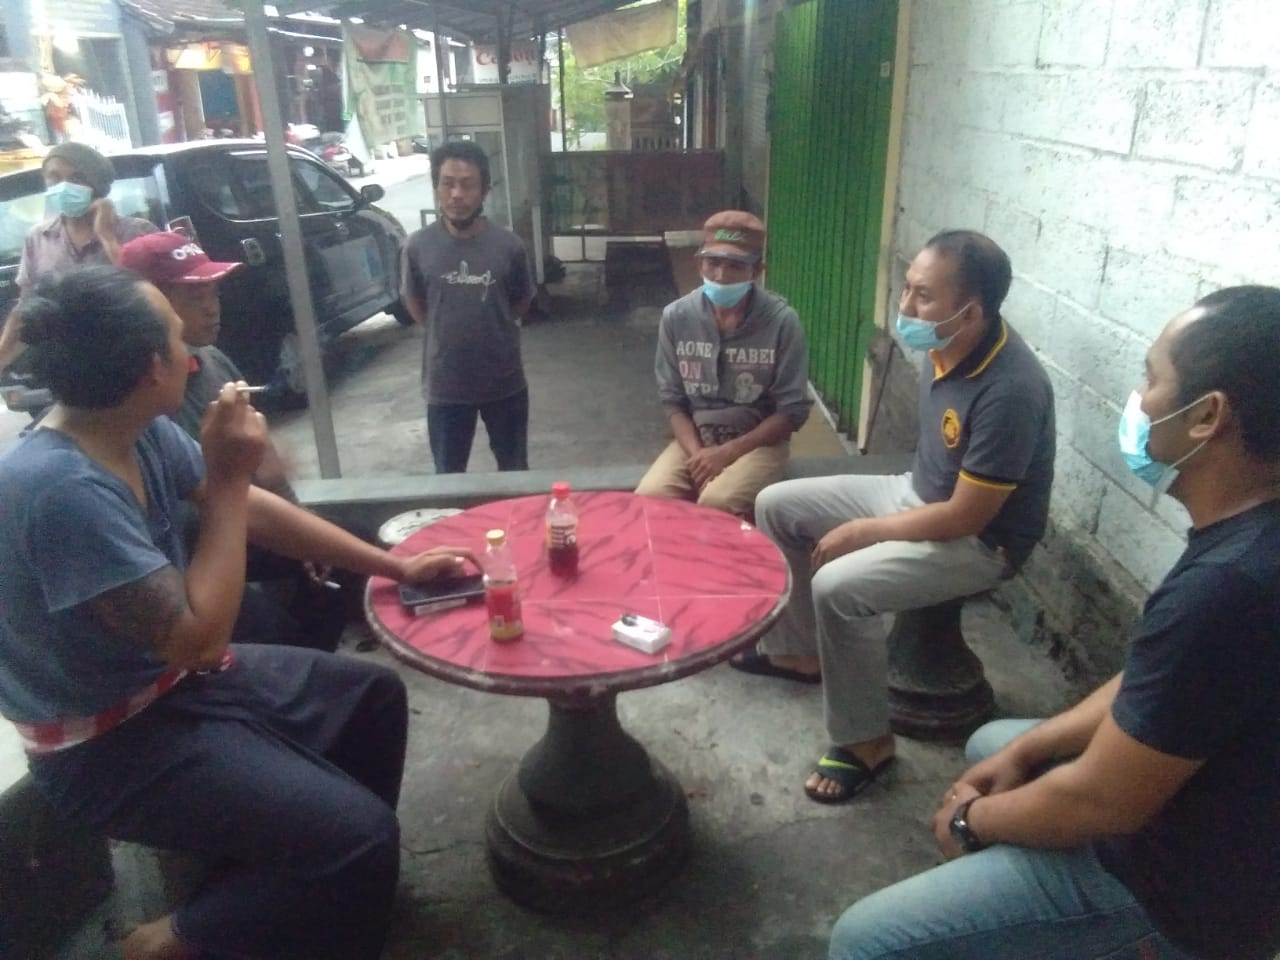 Mayat Dipantai Tejakula Diakui Keluarga Korban Dari Kintamani/Bangli